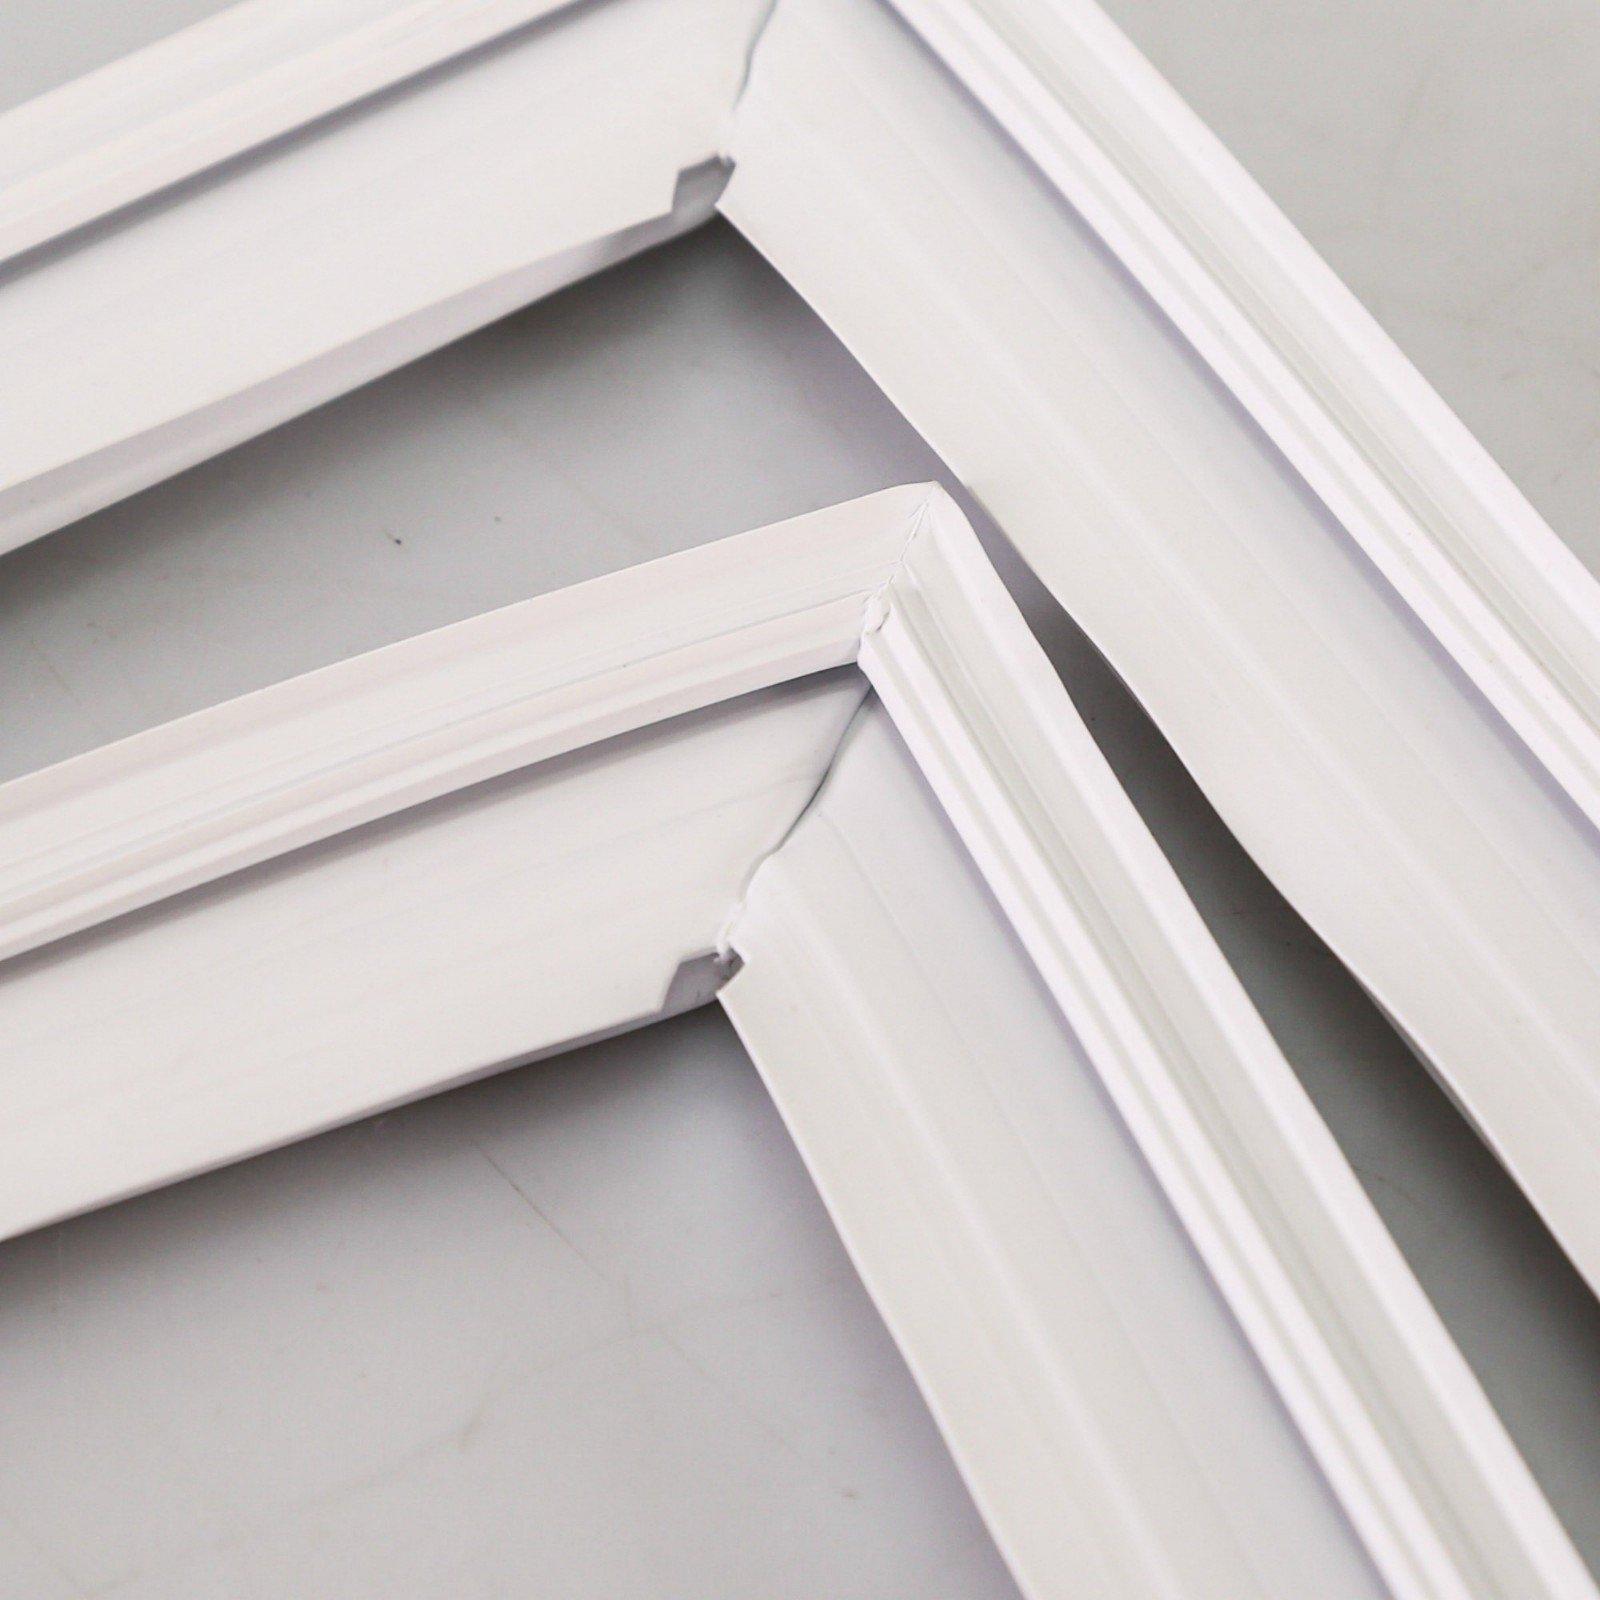 Frigidaire 5304507201 Freezer Door Gasket Genuine Original Equipment Manufacturer (OEM) Part for Frigidaire, Kenmore, Universal/Multiflex (Frigidaire), Gibson, Kenmore Elite, White-Westinghouse